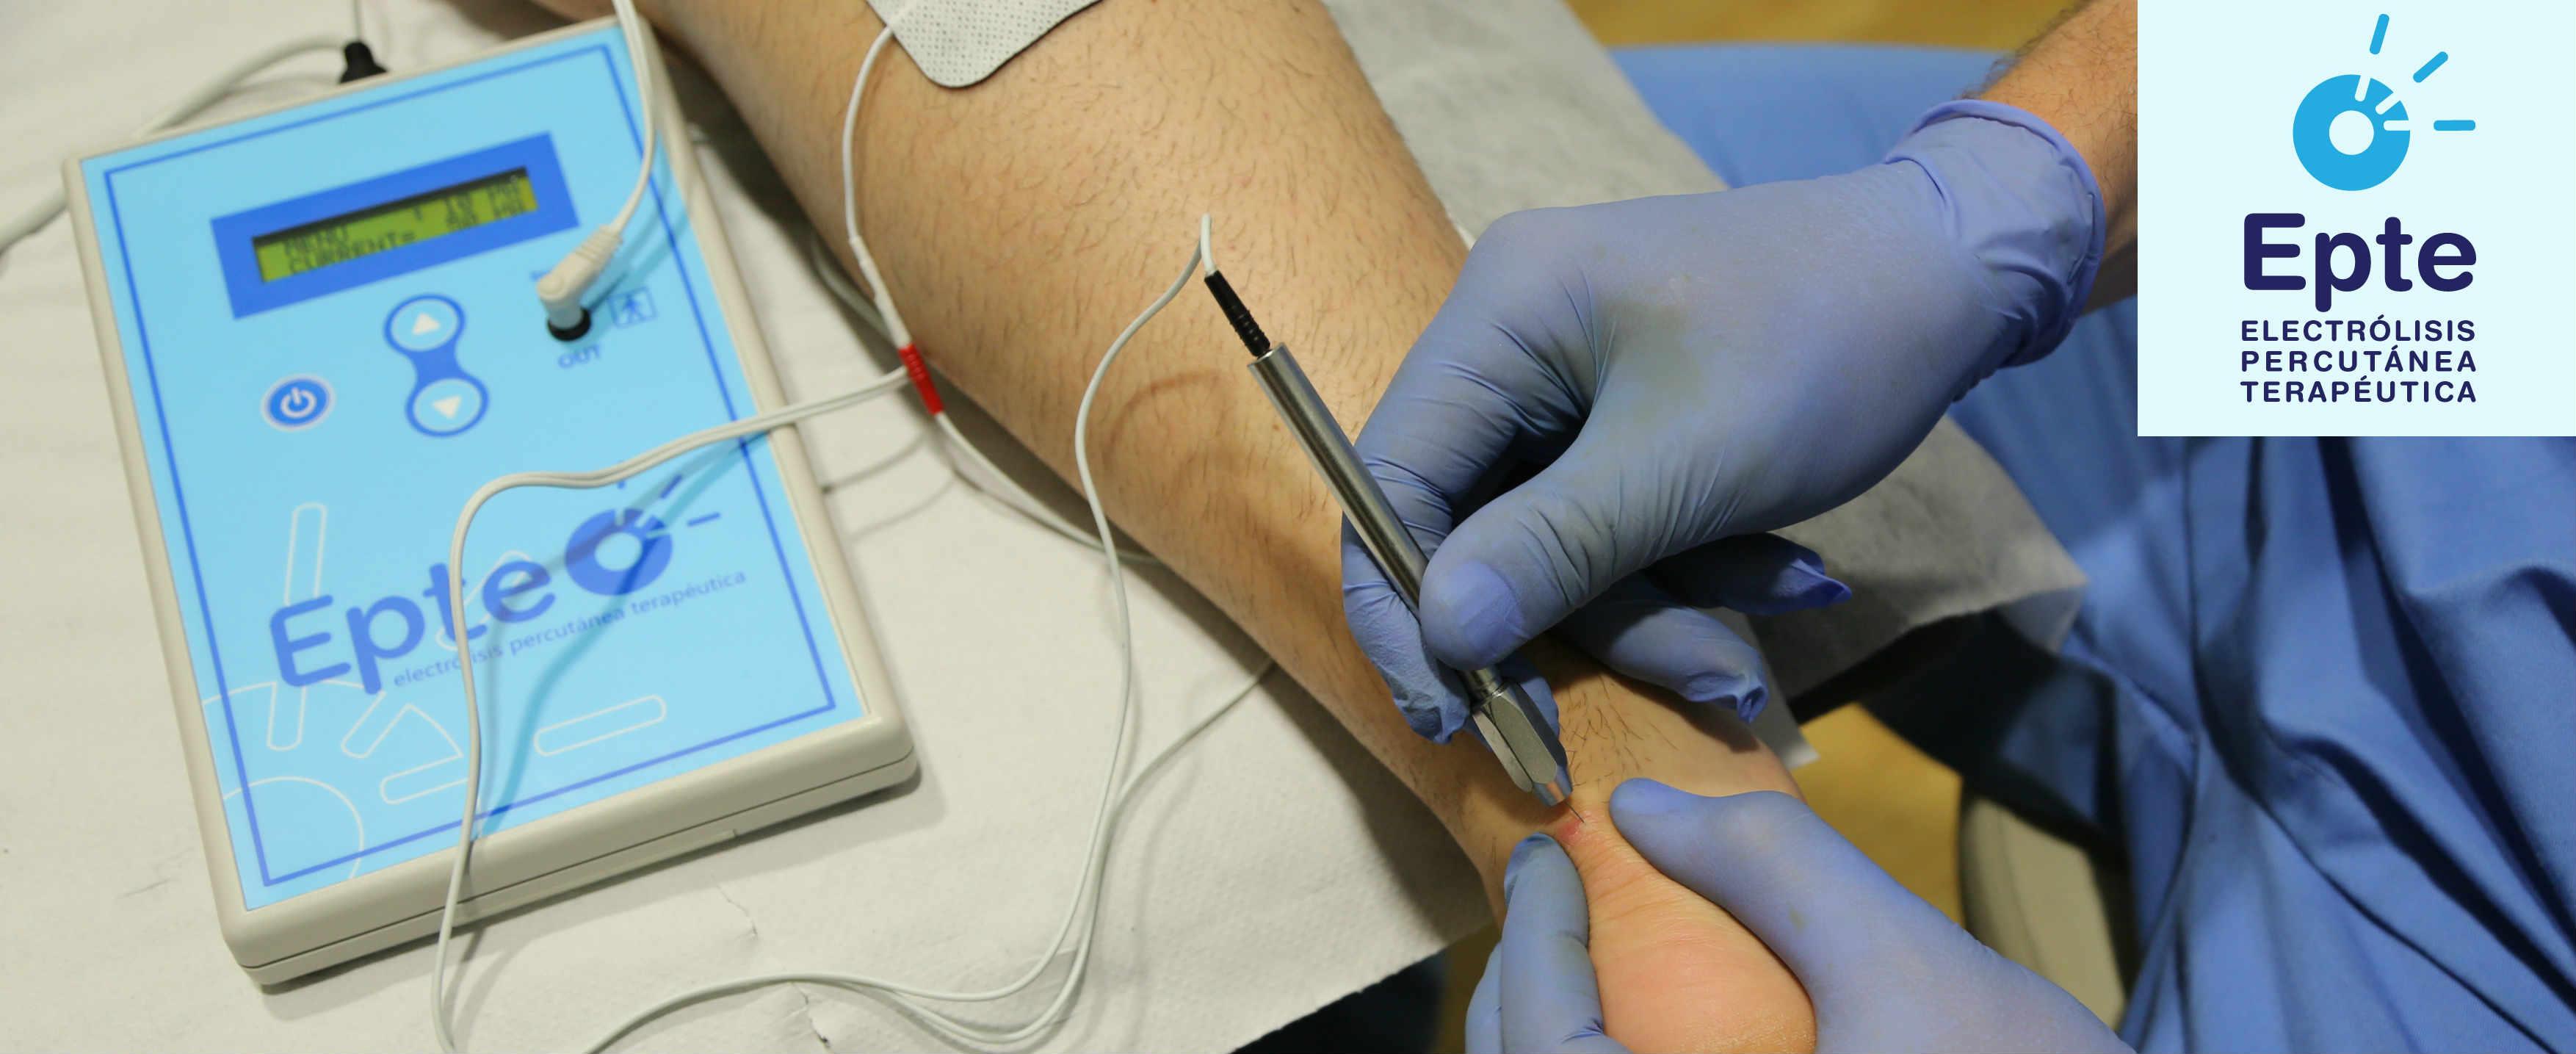 Cursos de electrólisis y aplicación EPTE para tendinopatías